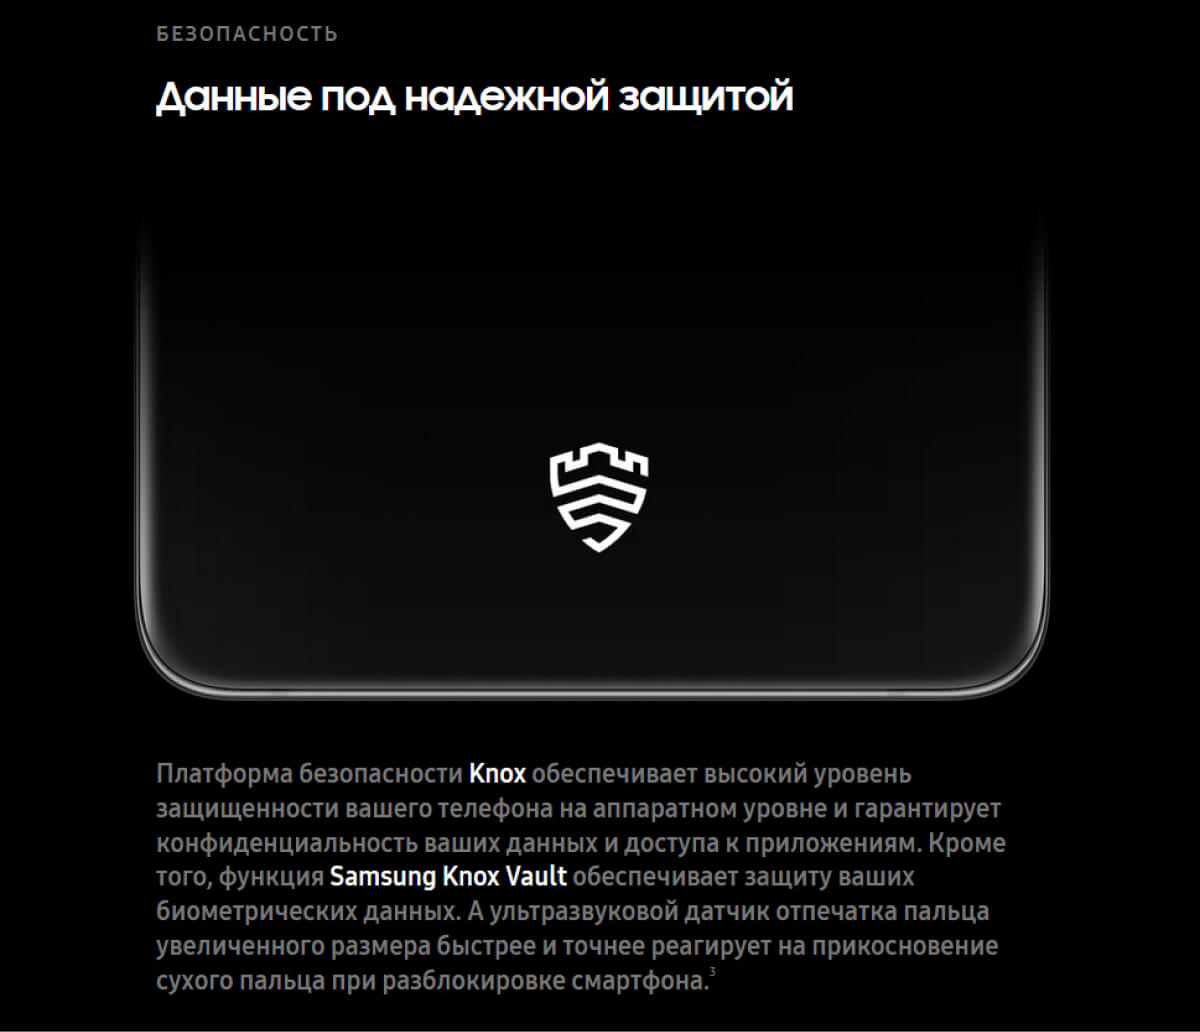 Samsung Galaxy S21 Ultra 5G 12/256 GB Серебряный фантом цена